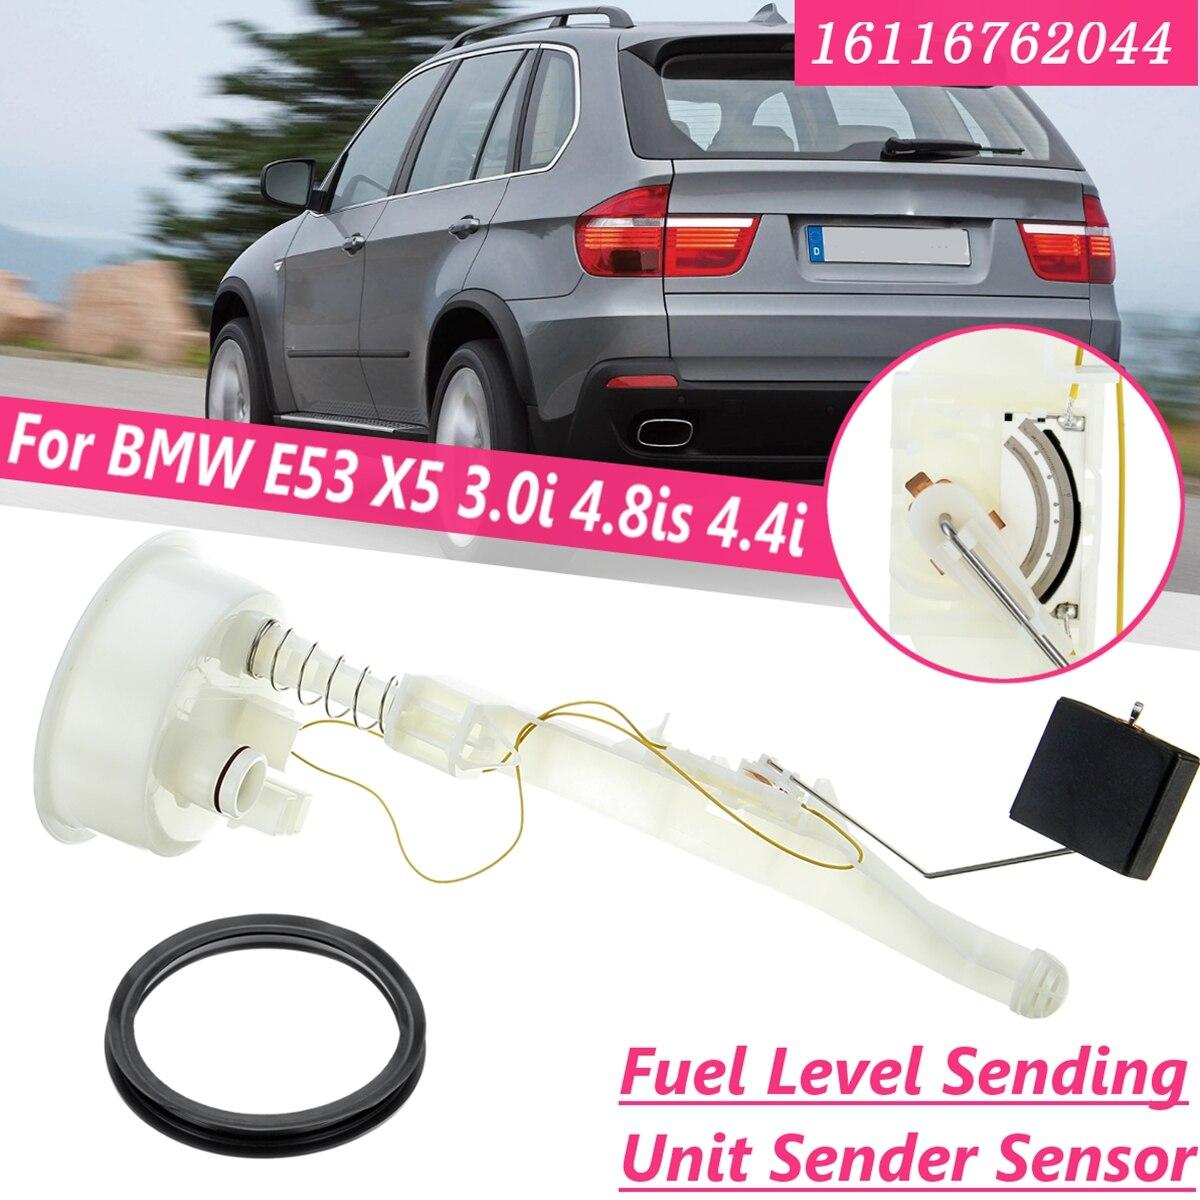 New Fuel Level Sending Unit Sender Sensor for BMW E53 X5 3.0i 4.8is 4.4i